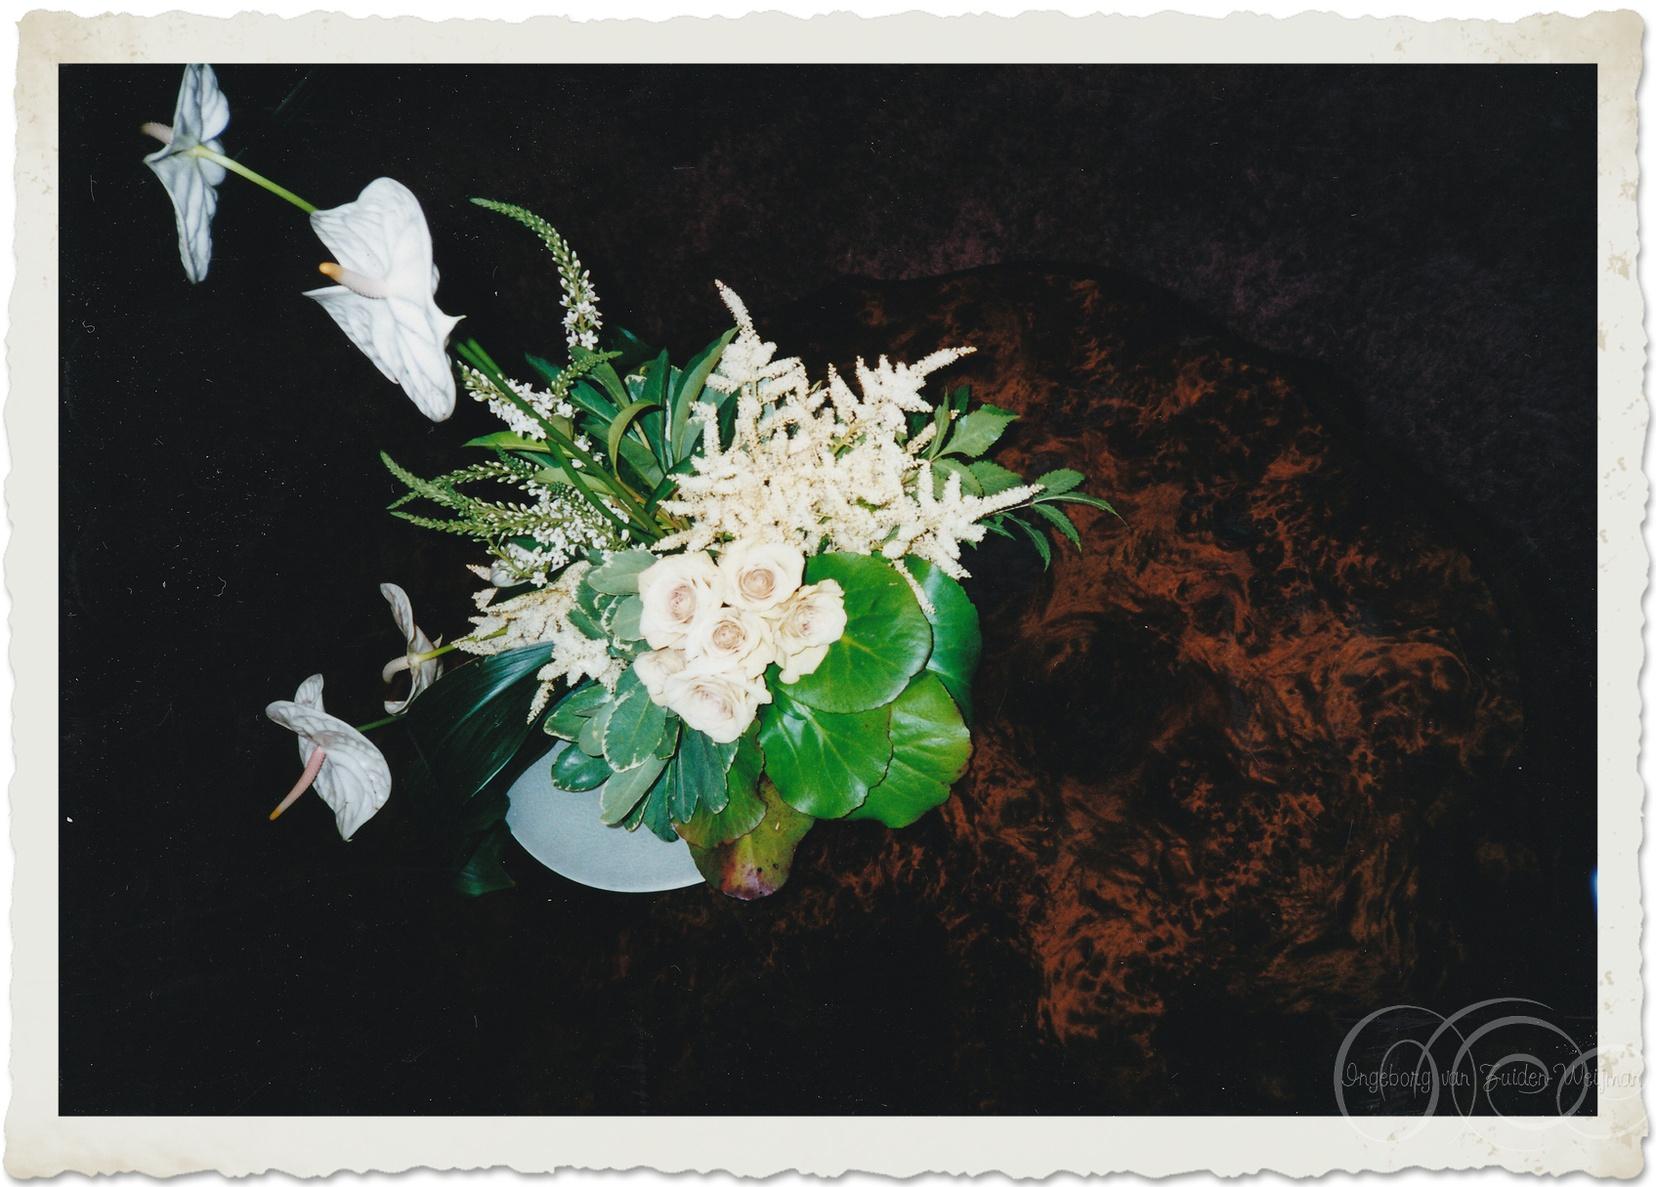 Flower arrangement by Ingeborg van Zuiden with white roses, Anthurrium, Spirea, Astilbe and Bergenia leaves